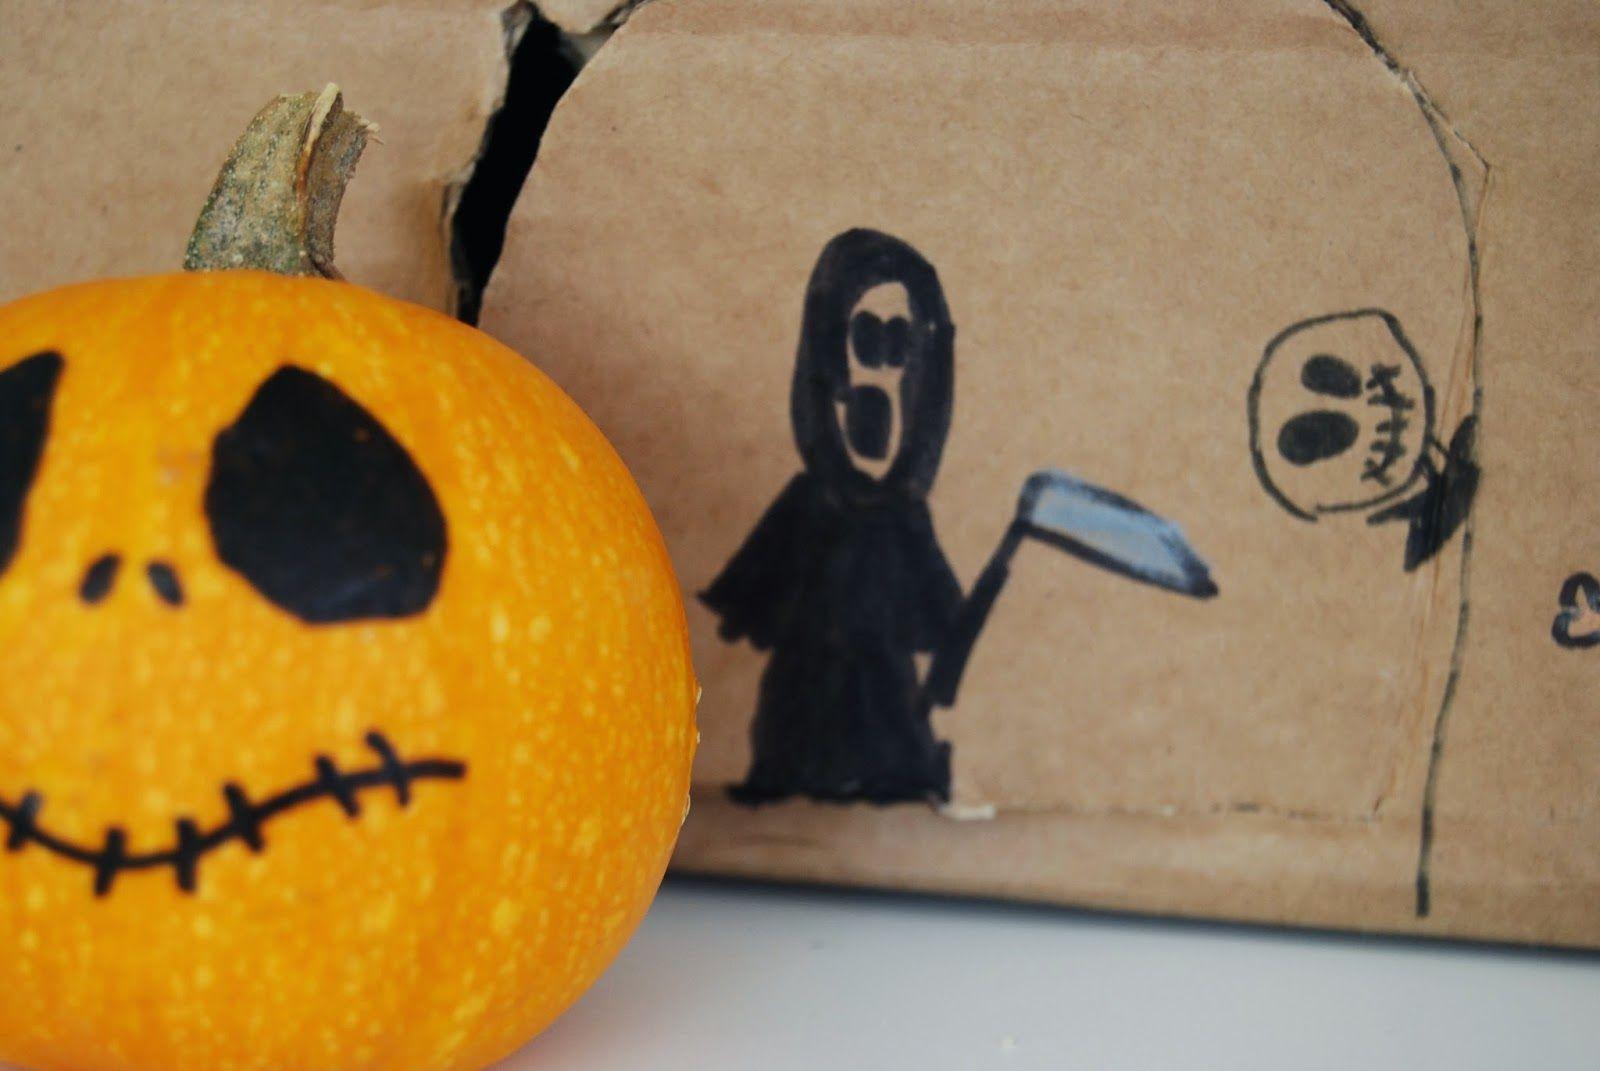 Haunted house made from a box, good idea for kids in Halloween. Casa encantada con una caja de carton, DIY para niños en Halloween.